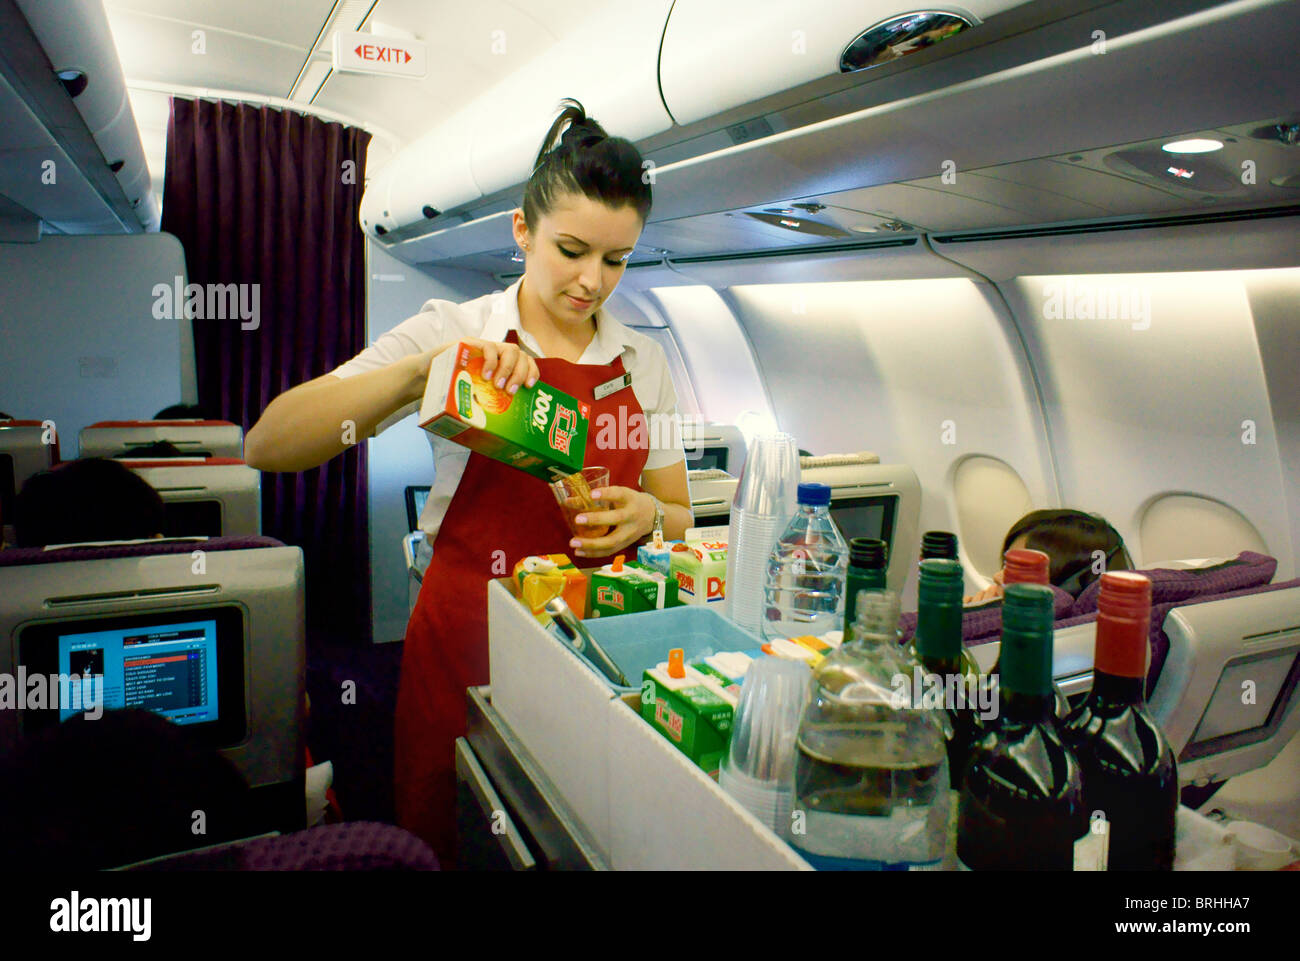 Long Haul Flight Air Stewardess With Food Drinks Aisle